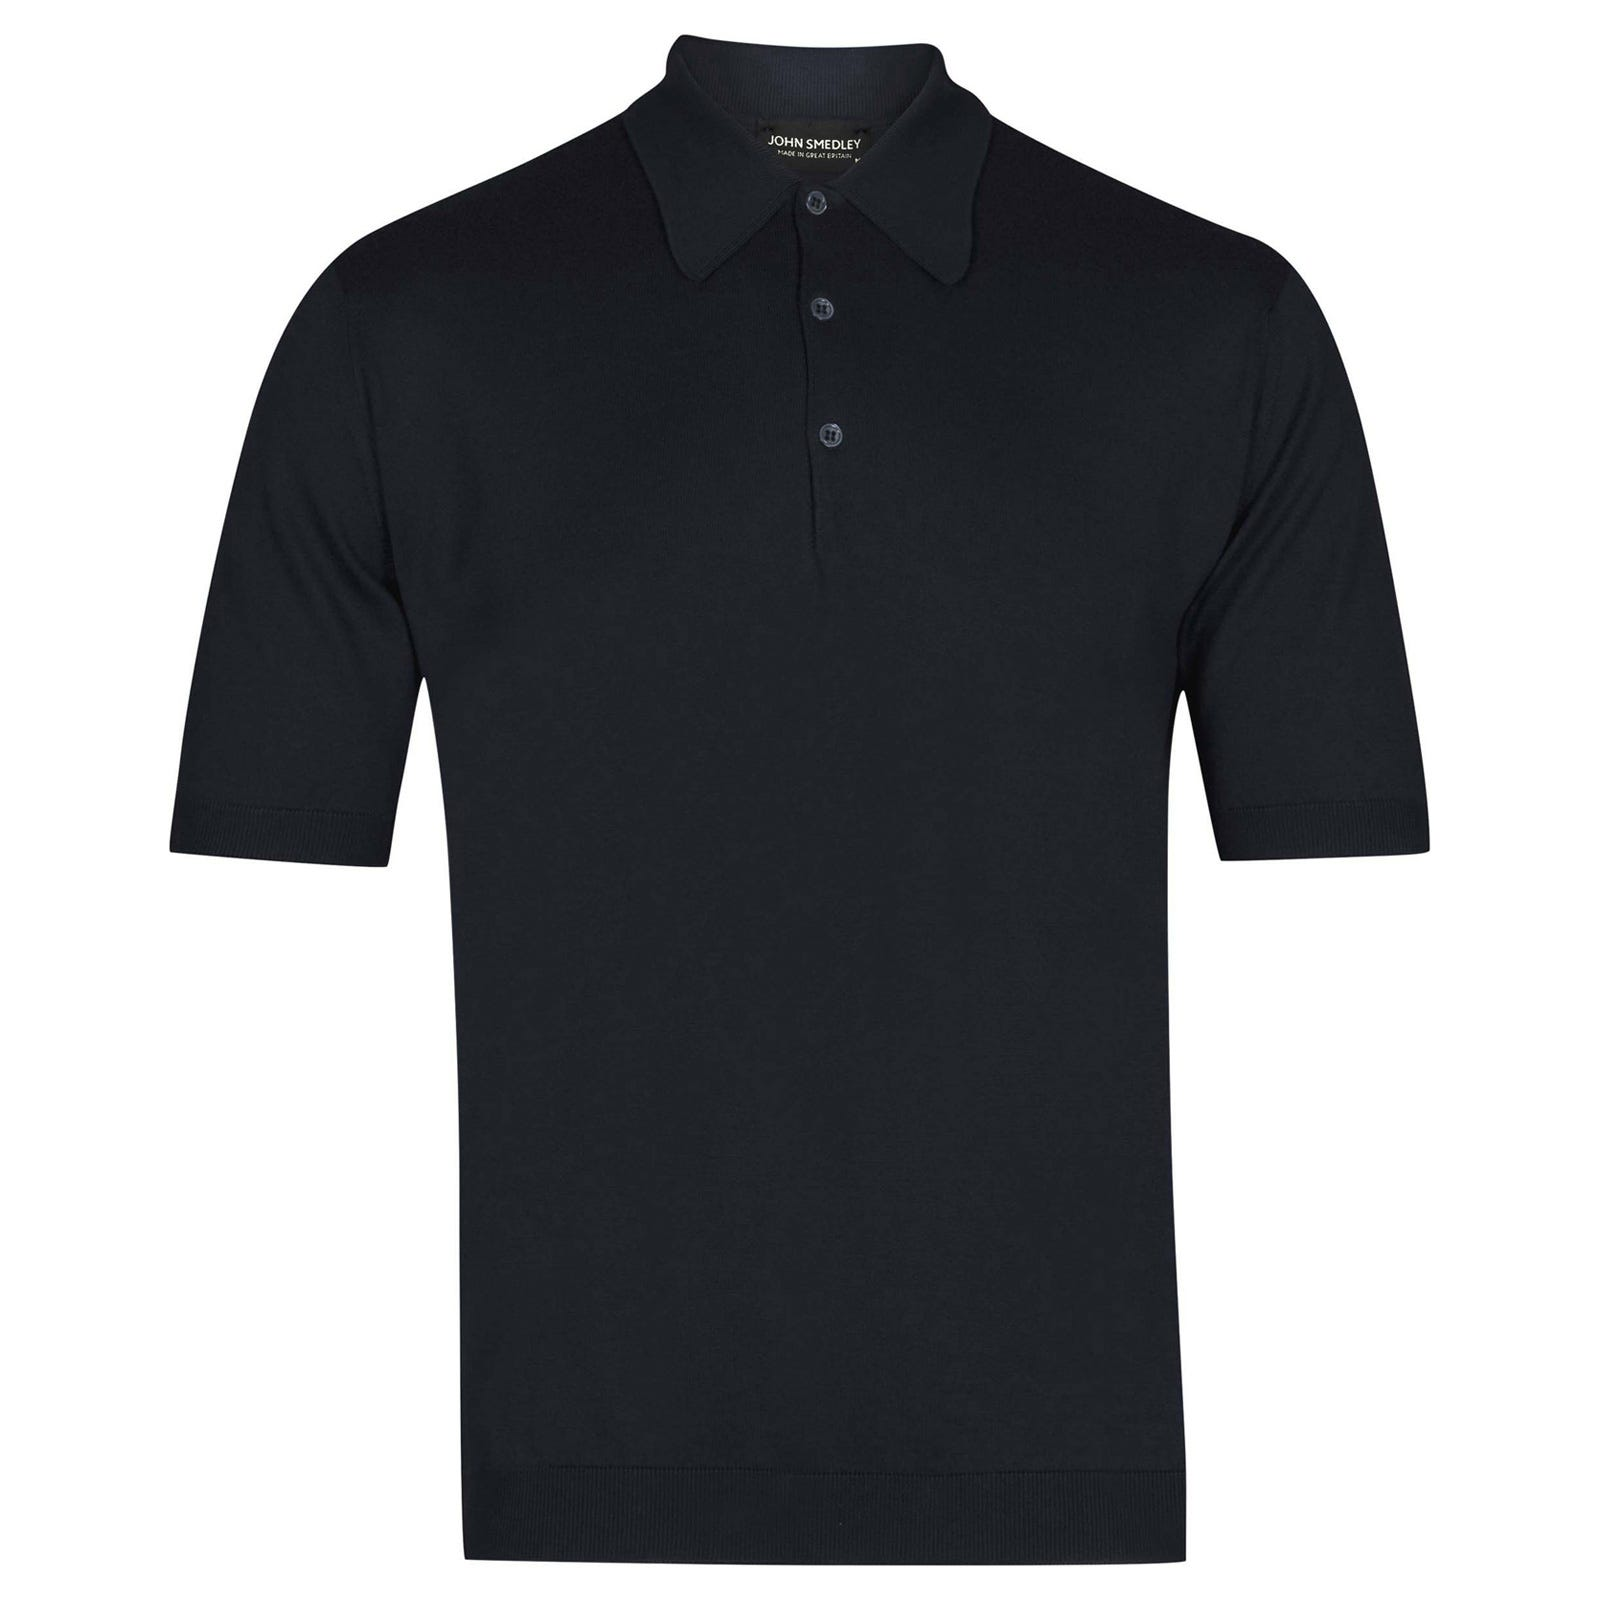 John Smedley Isis Sea Island Cotton Shirt in Navy-XS